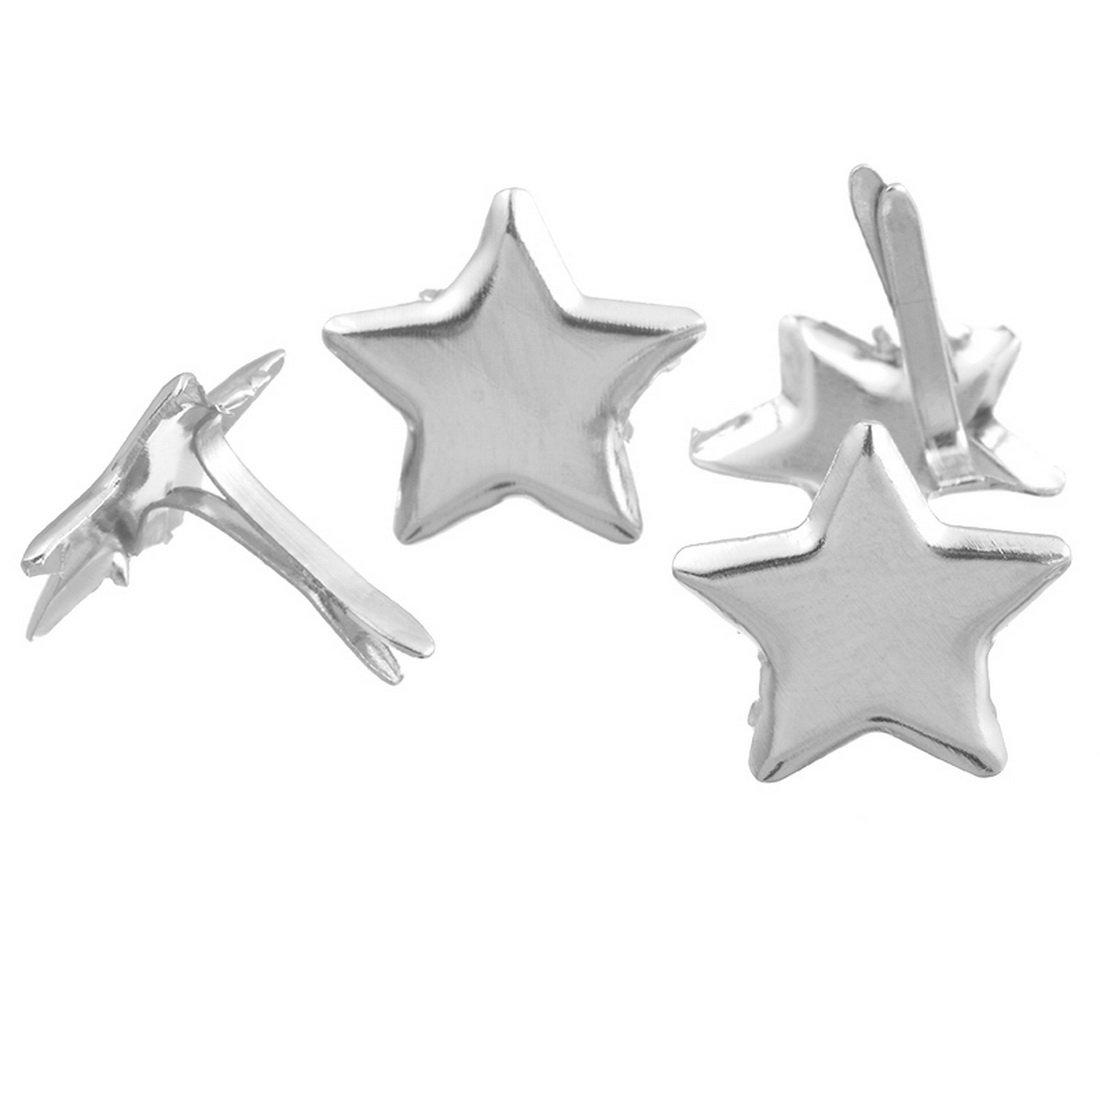 Loweryeah Star Shaped Mini Brads for DIY Scrapbooking Embellishment Pack of 50pcs